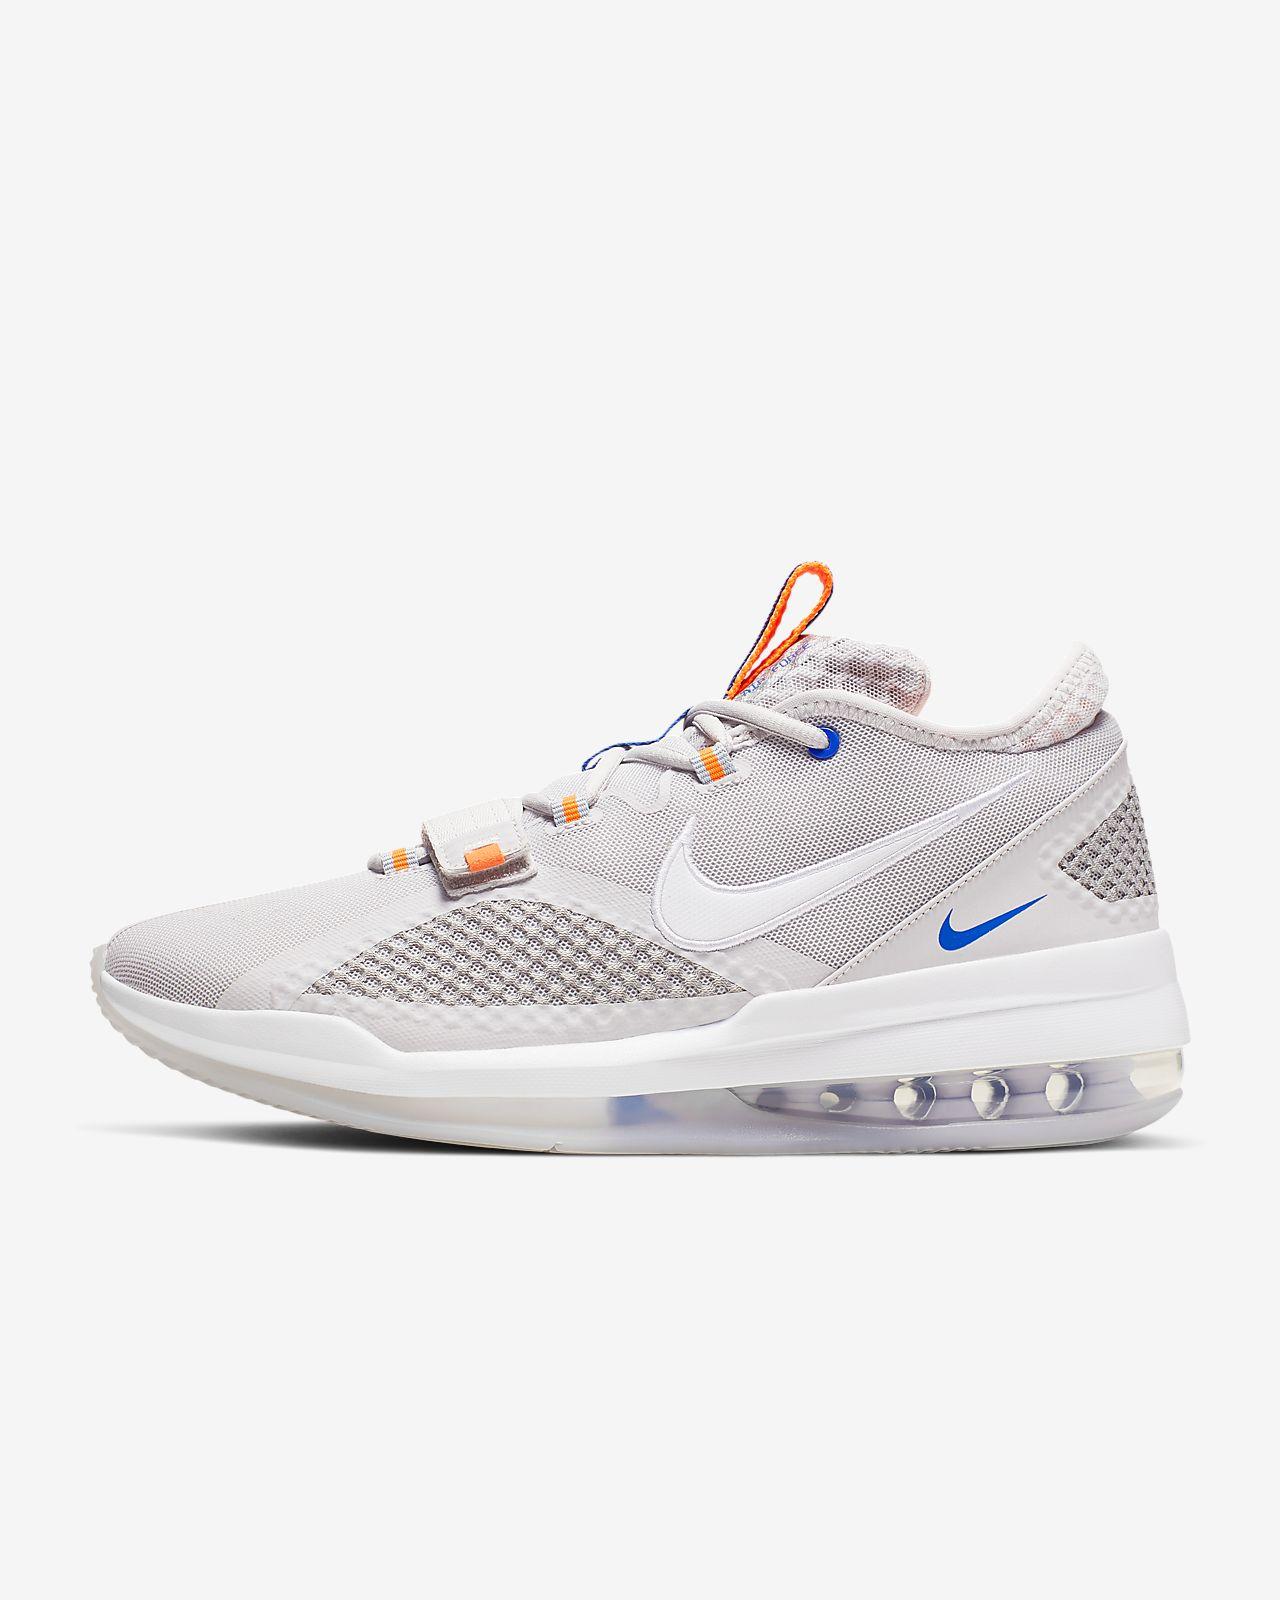 regard détaillé 1d098 b4f7d Nike Air Force Max Low Basketball Shoe